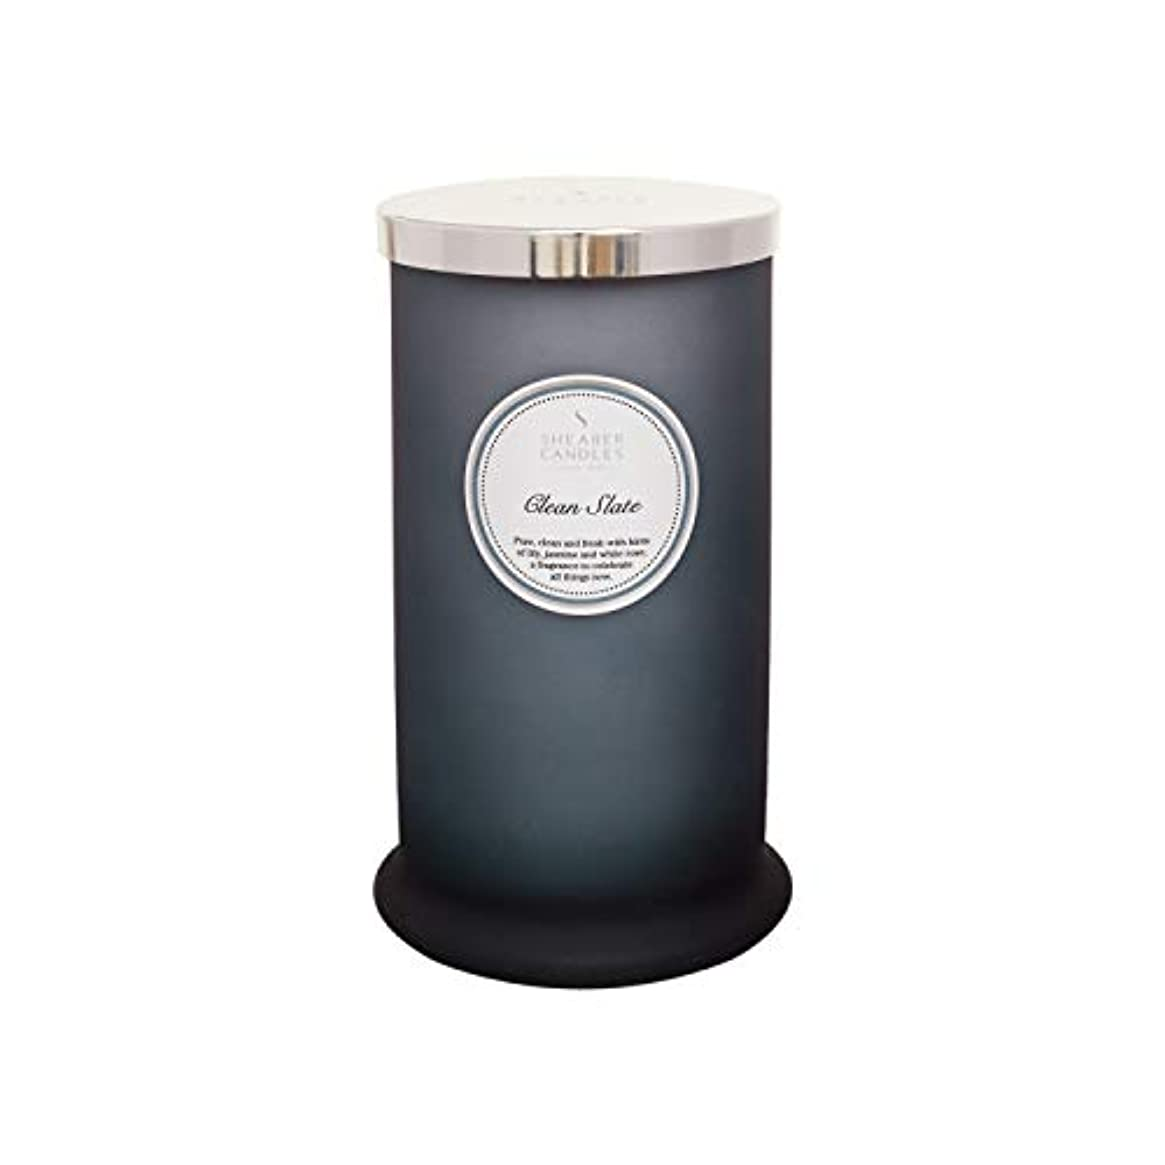 Shearer キャンドル クリーンスレート 香り付き トールピラージャーキャンドル コットン芯 フレグランス&エッセンシャルオイル グレー ホワイトシルバー ラージ